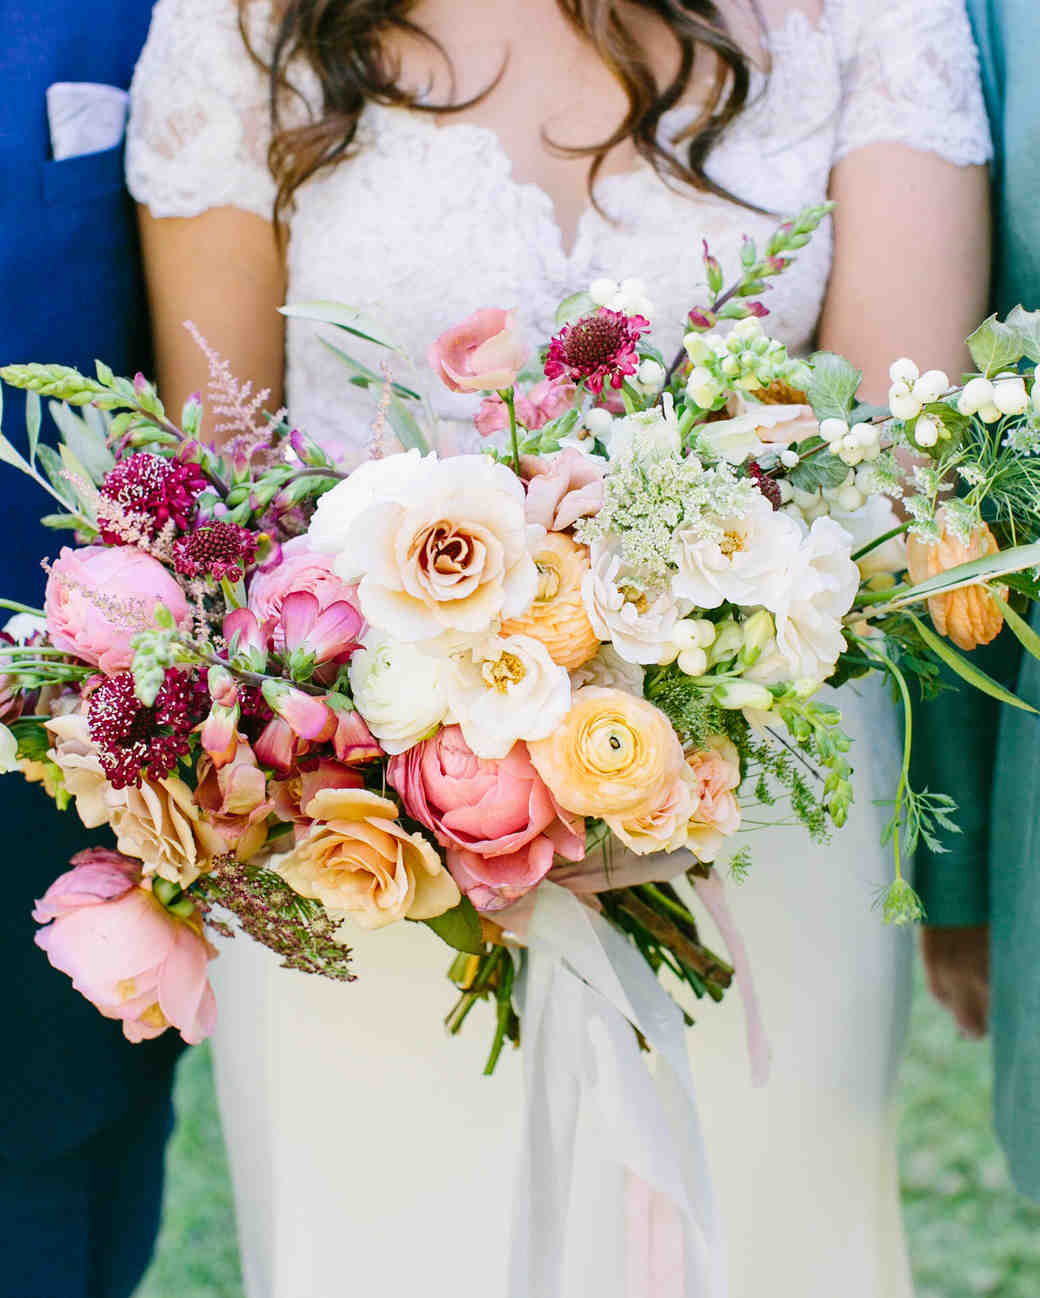 Pastel Bouquet with Orange Ranunculus and Pink Peonies